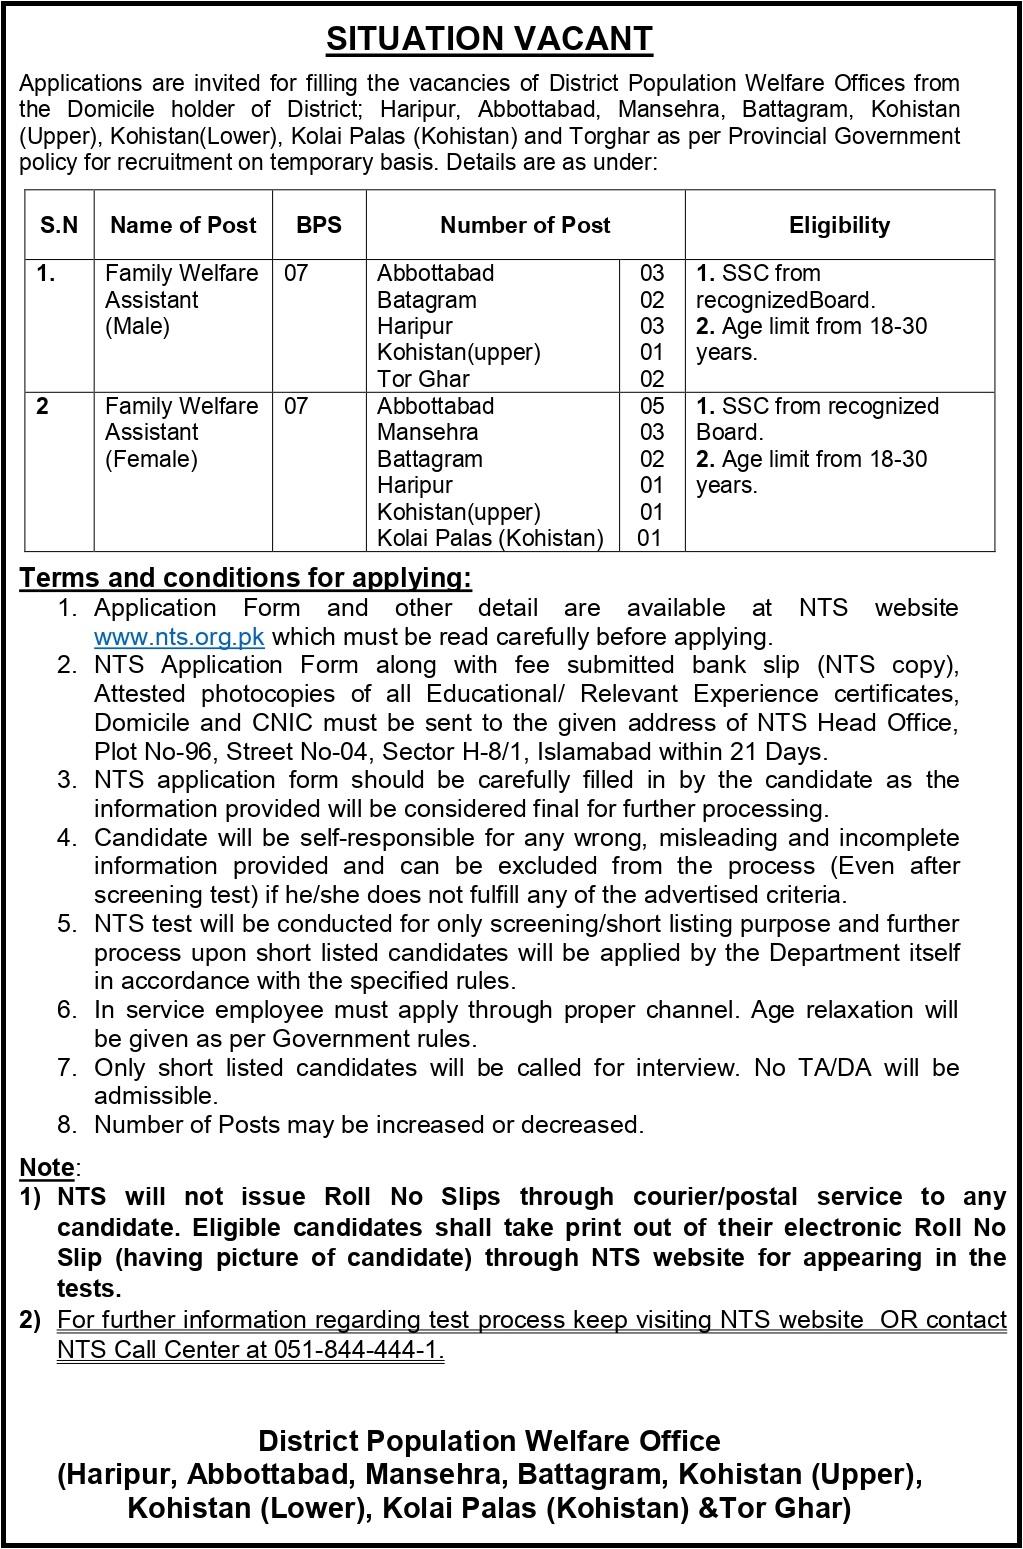 KPK District Population Welfare Department Jobs 2019 NTS Application Form Online